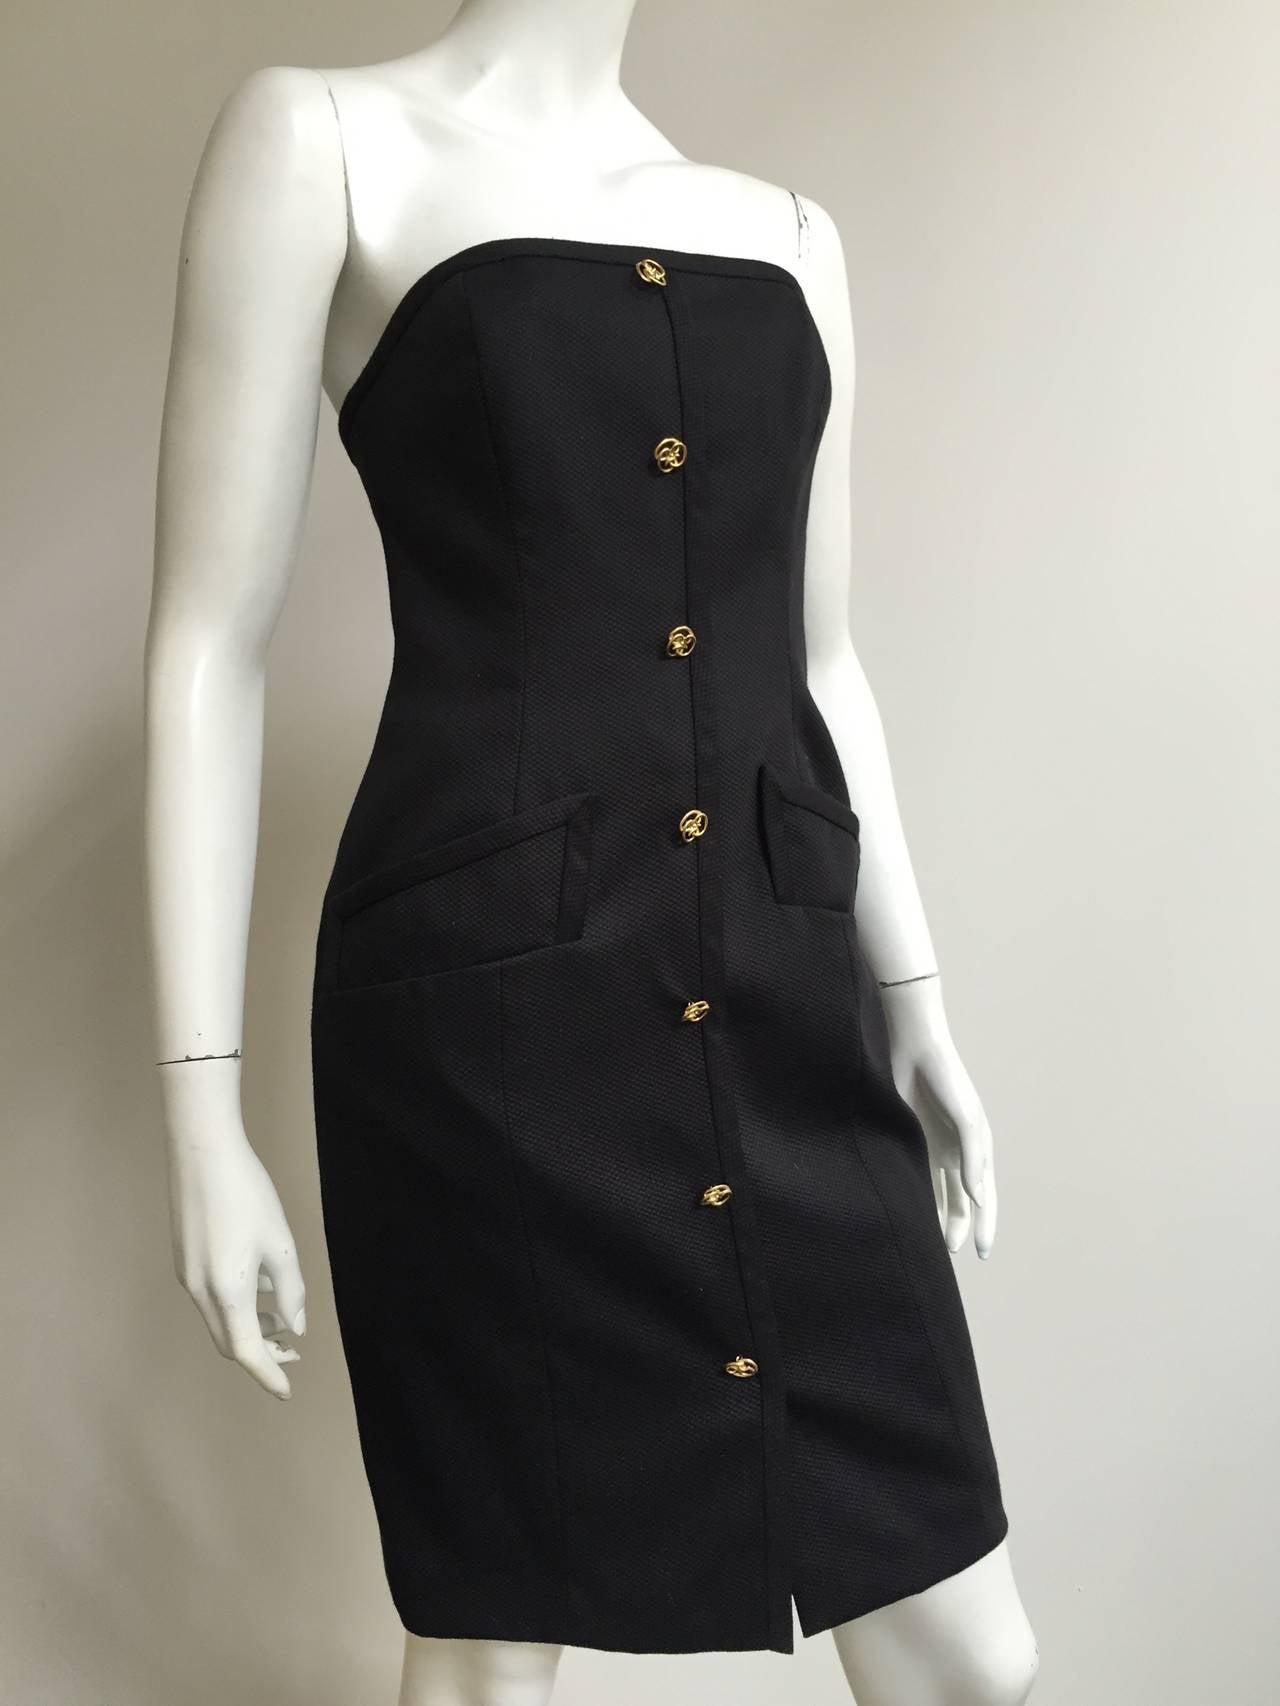 Bill Blass 90s Black Strapless Dress With Pockets Size 4. 2